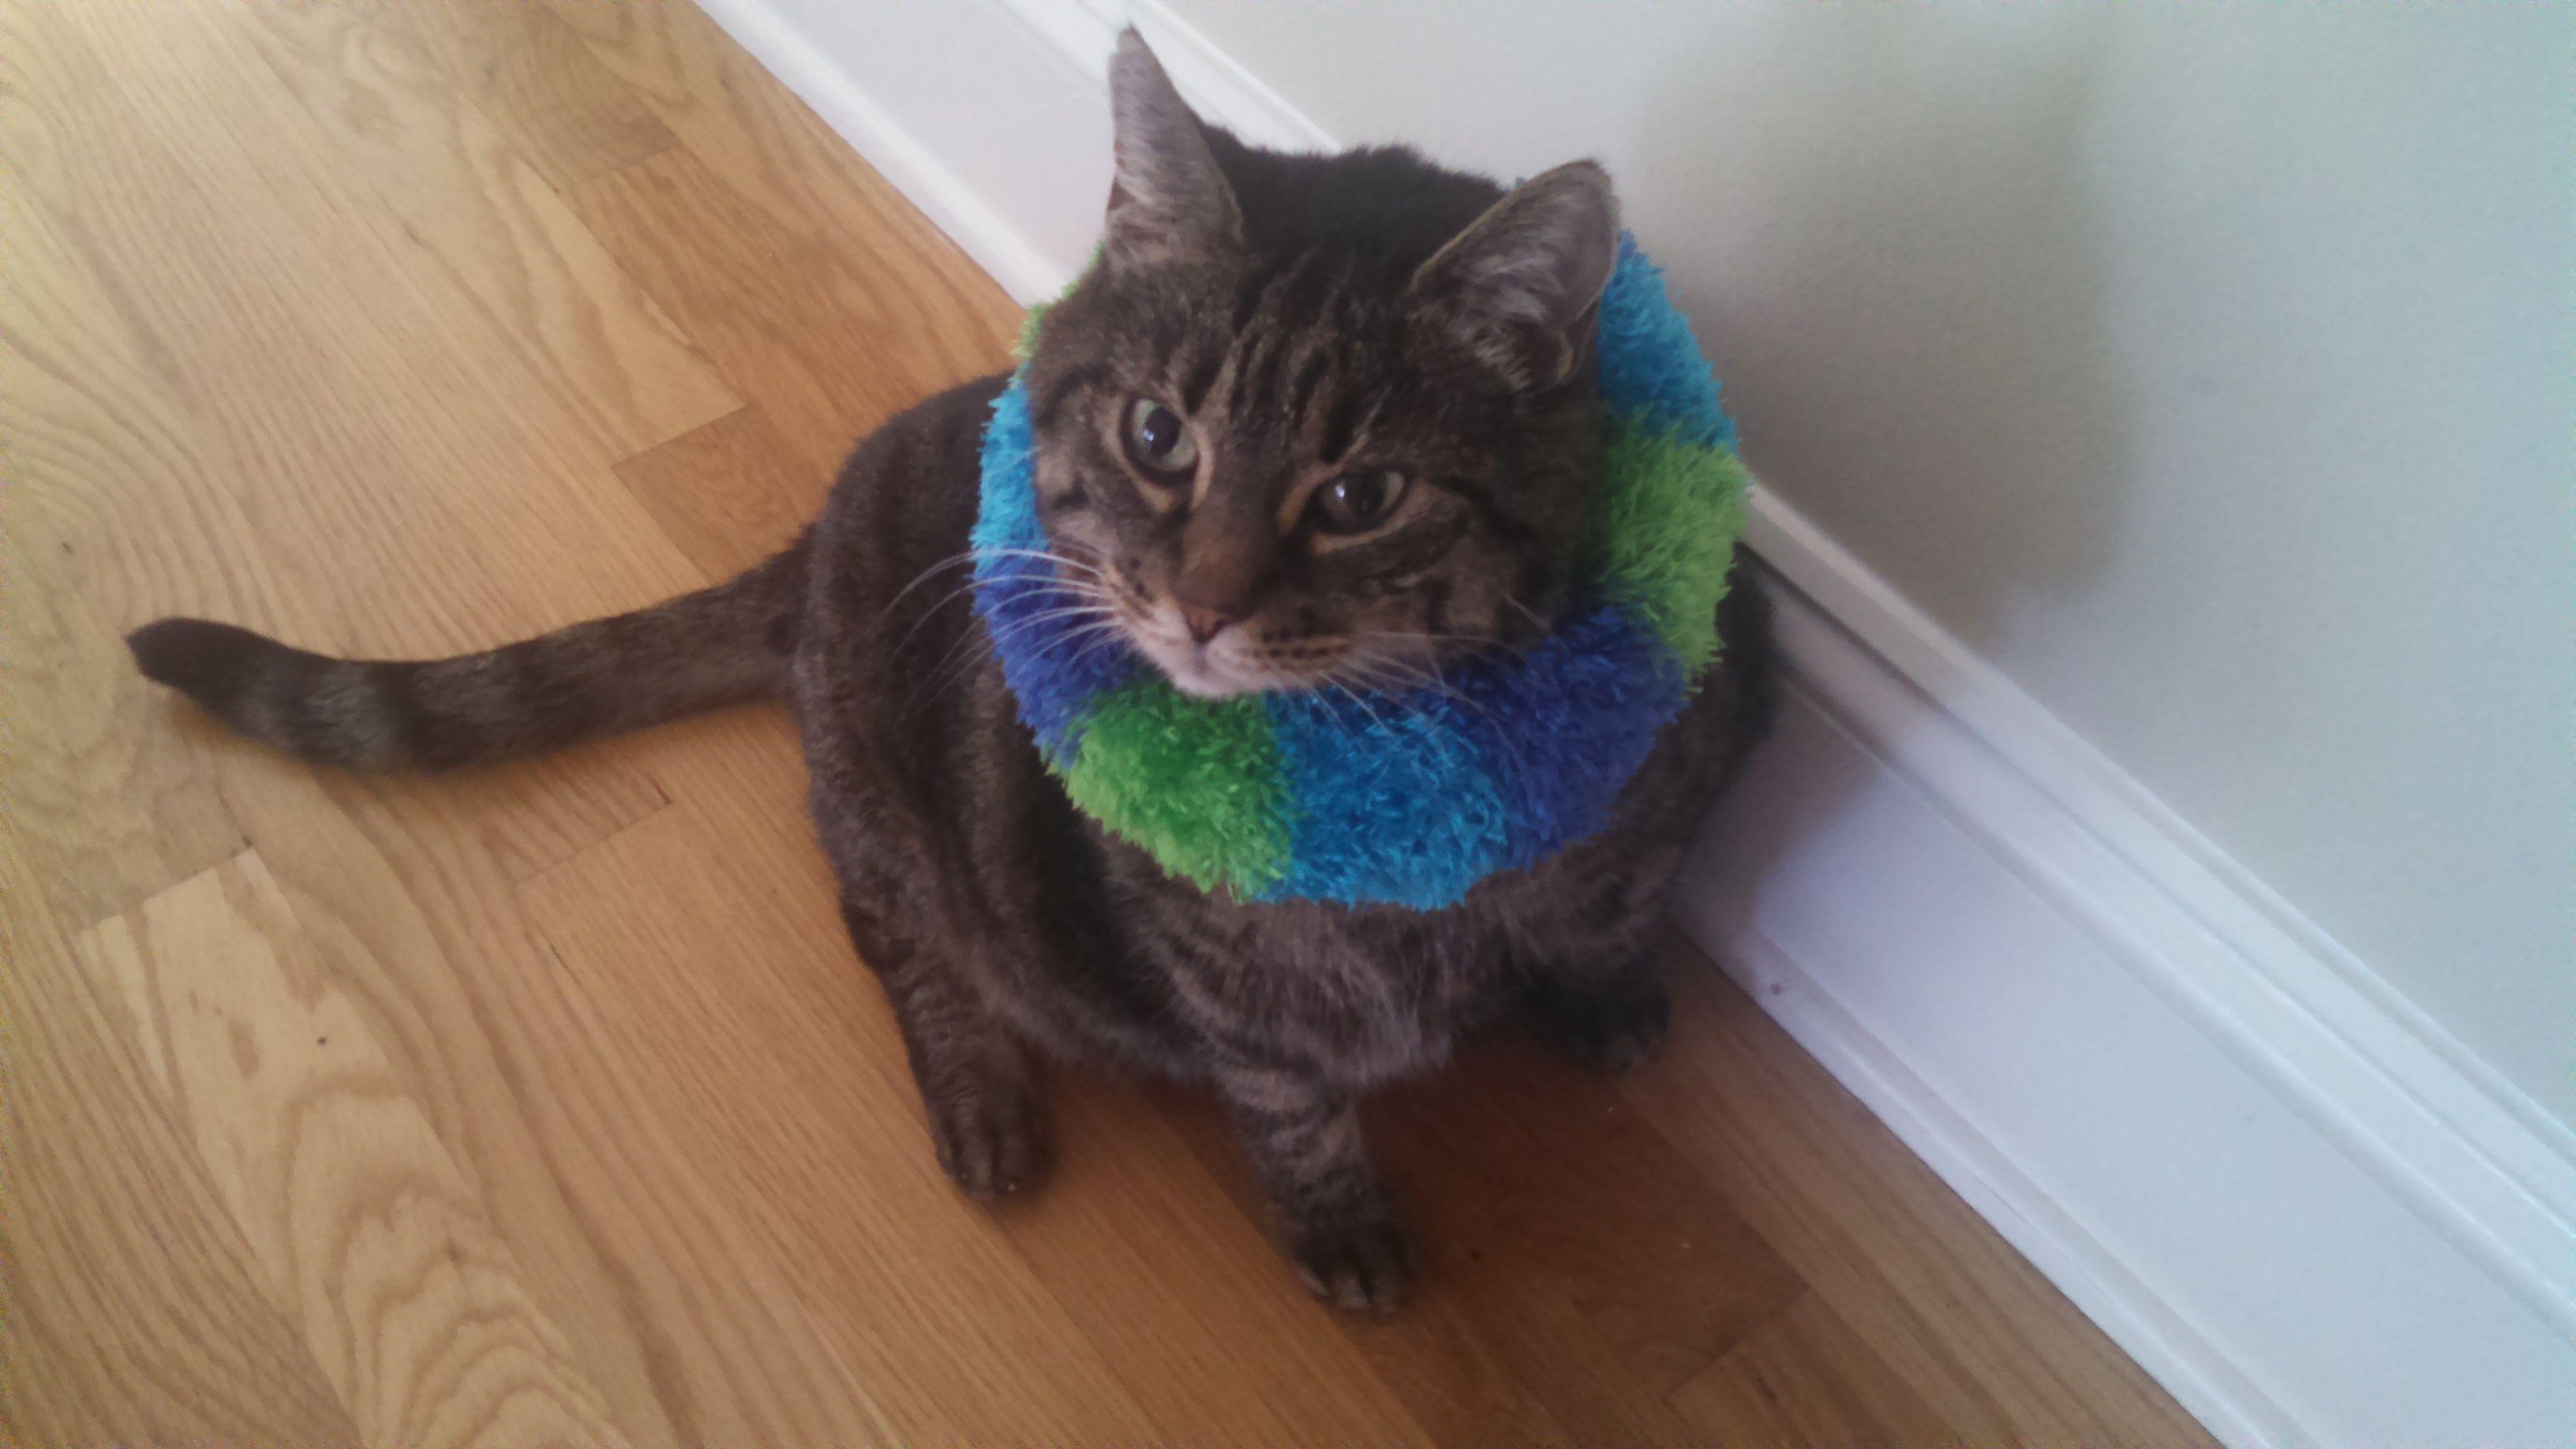 83f25a15a2bd37eac9f7627470657b21 - How To Get My Cat To Wear A Collar